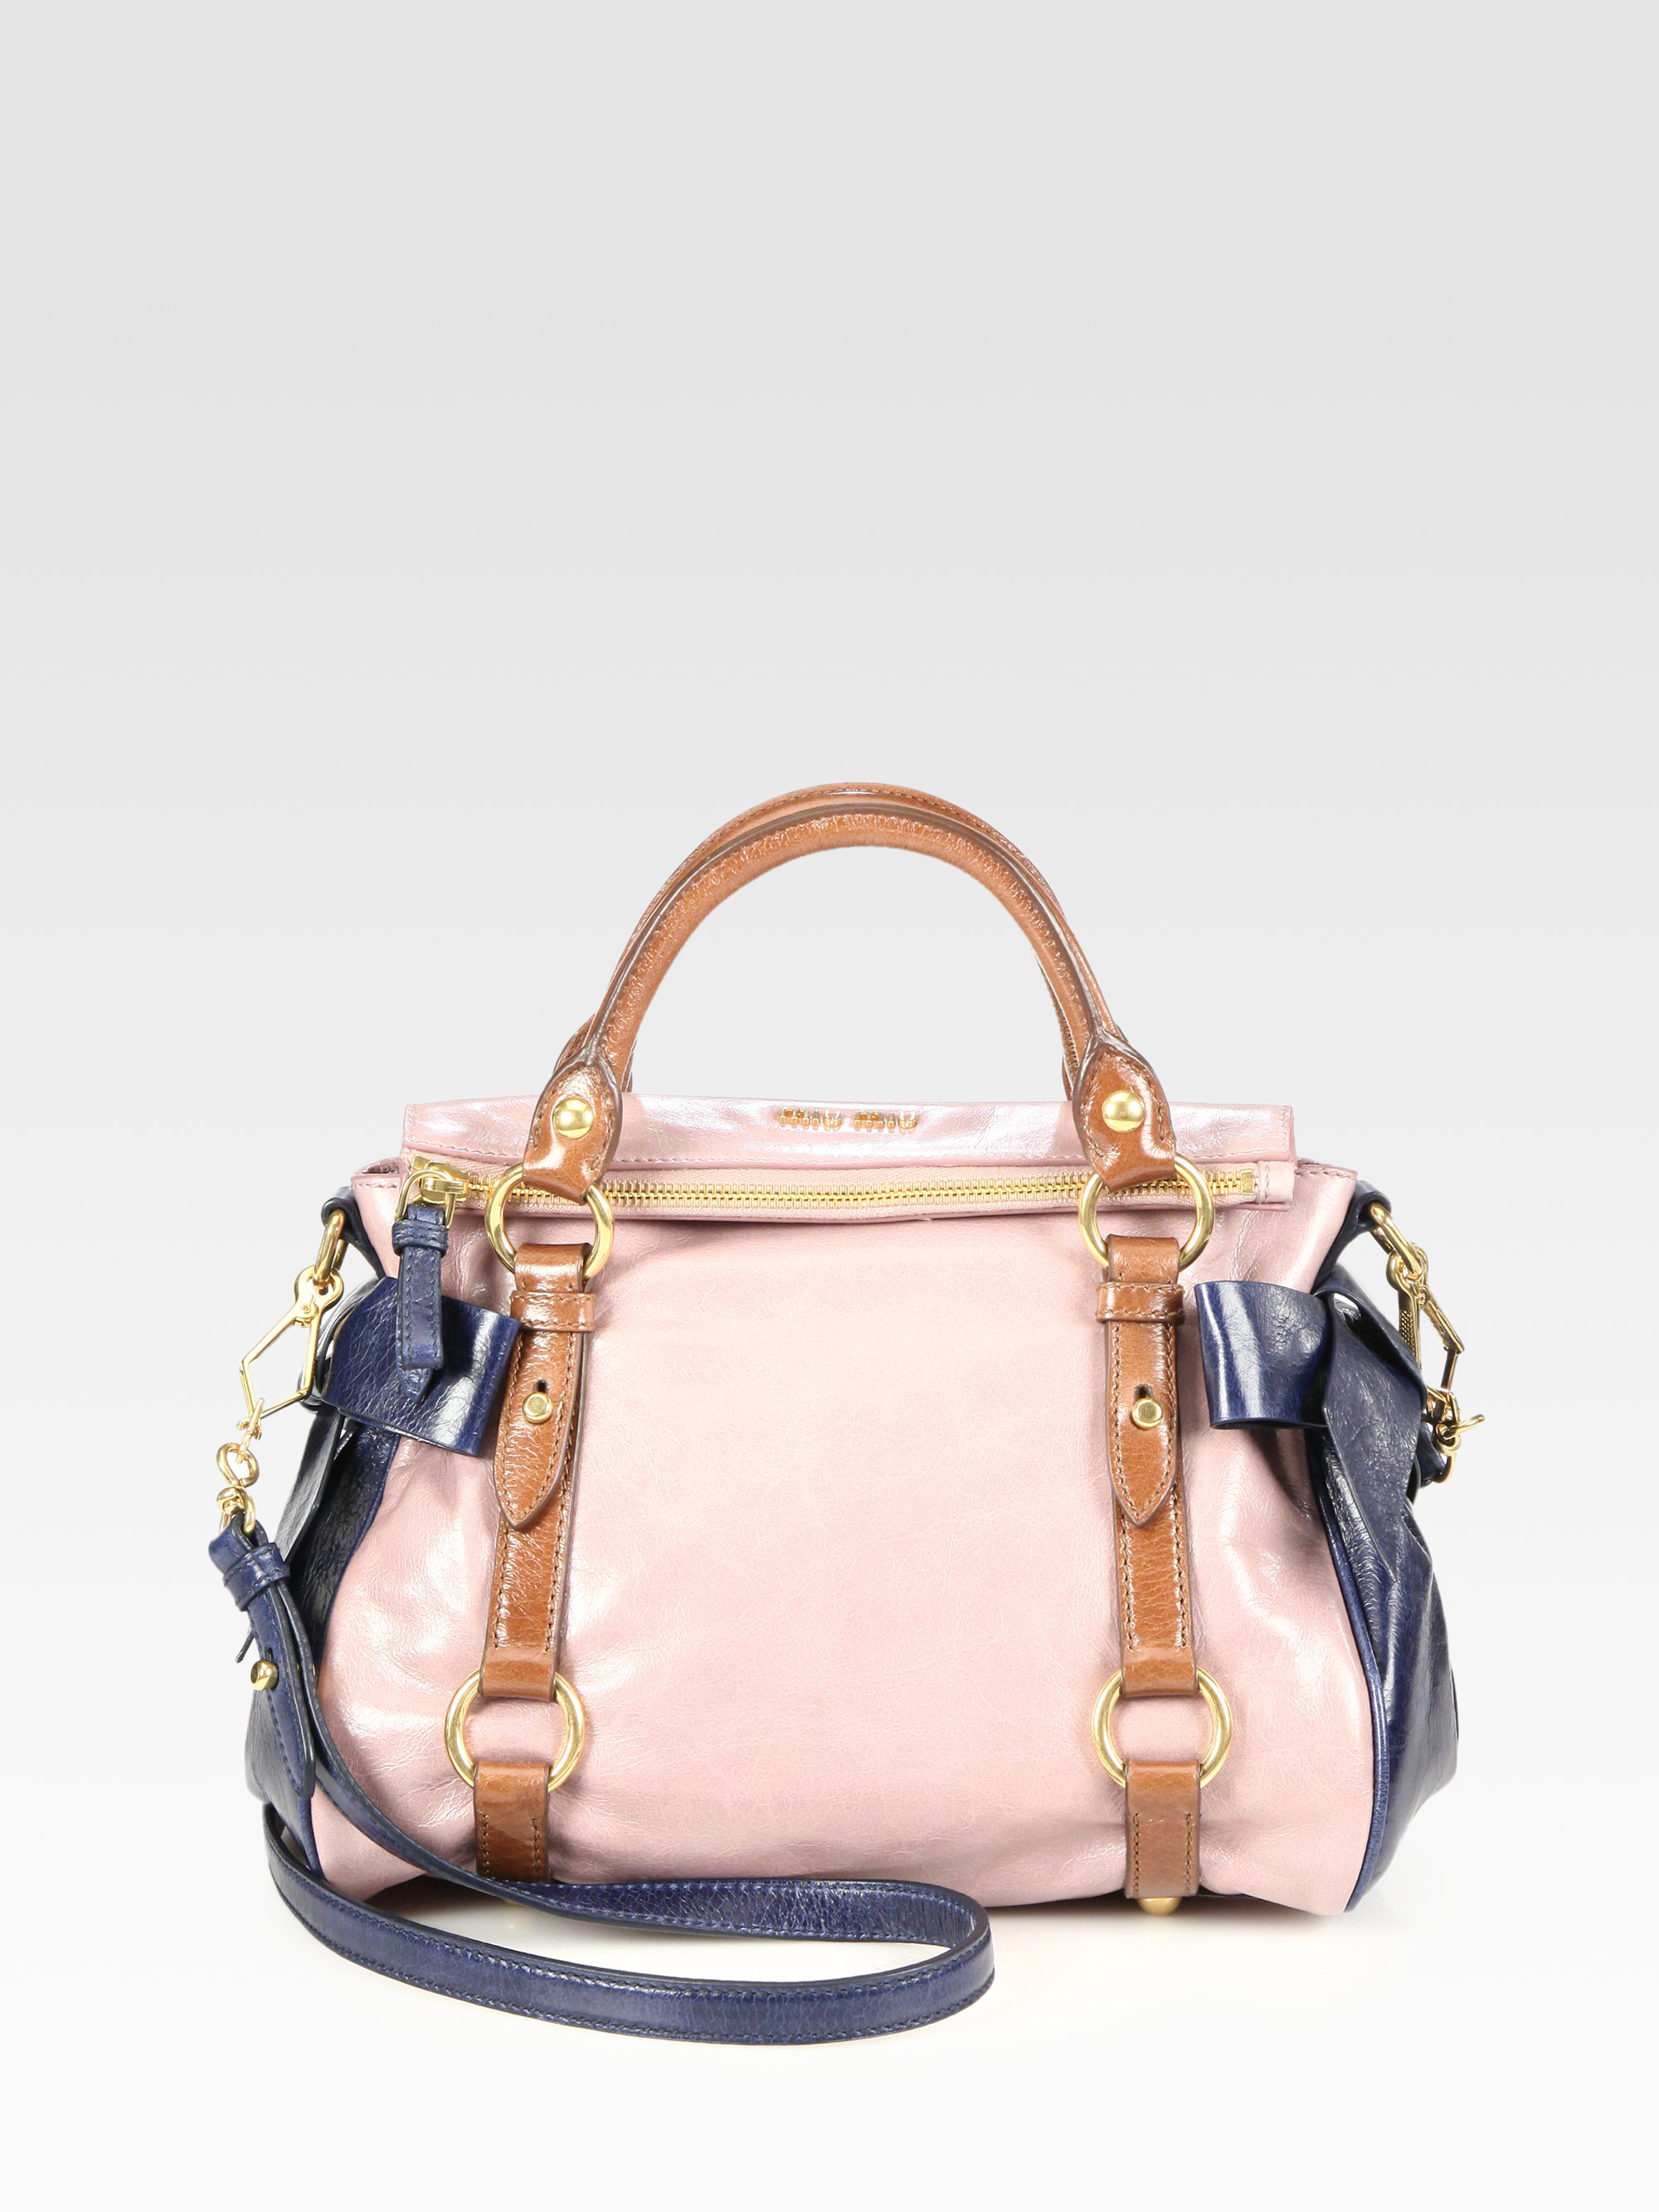 Lyst miu vitello lux small bow satchel in pink jpg 2000x2667 Lux bow miu  vitello bags e32c0f2d13